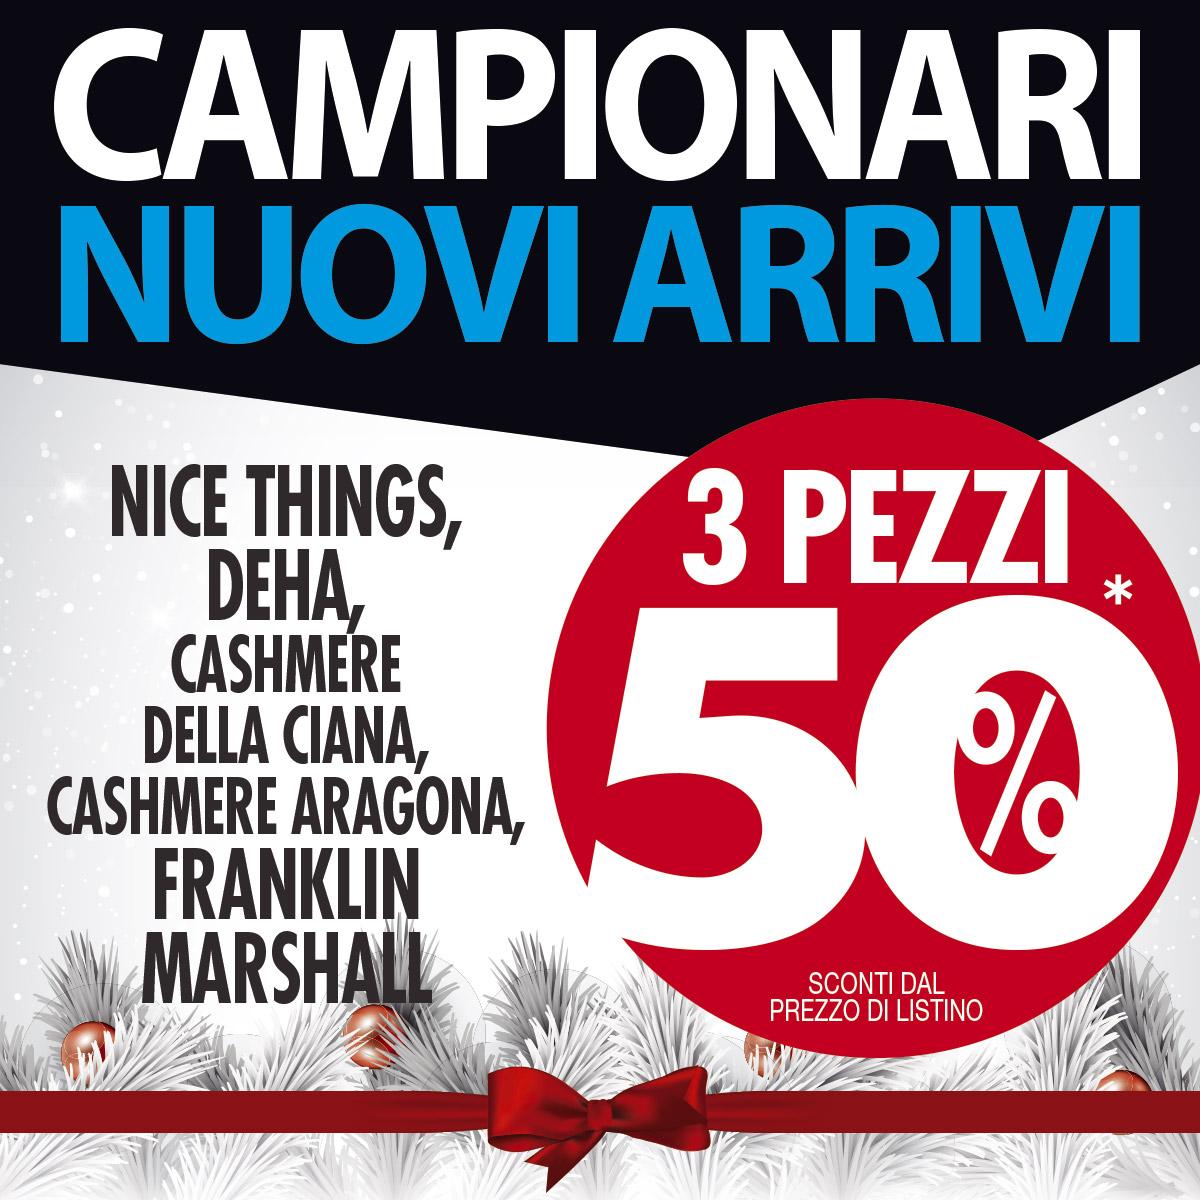 Promo VERNANTE CAMPIONARI NUOVI ARRIVI 3pz Sconto 50